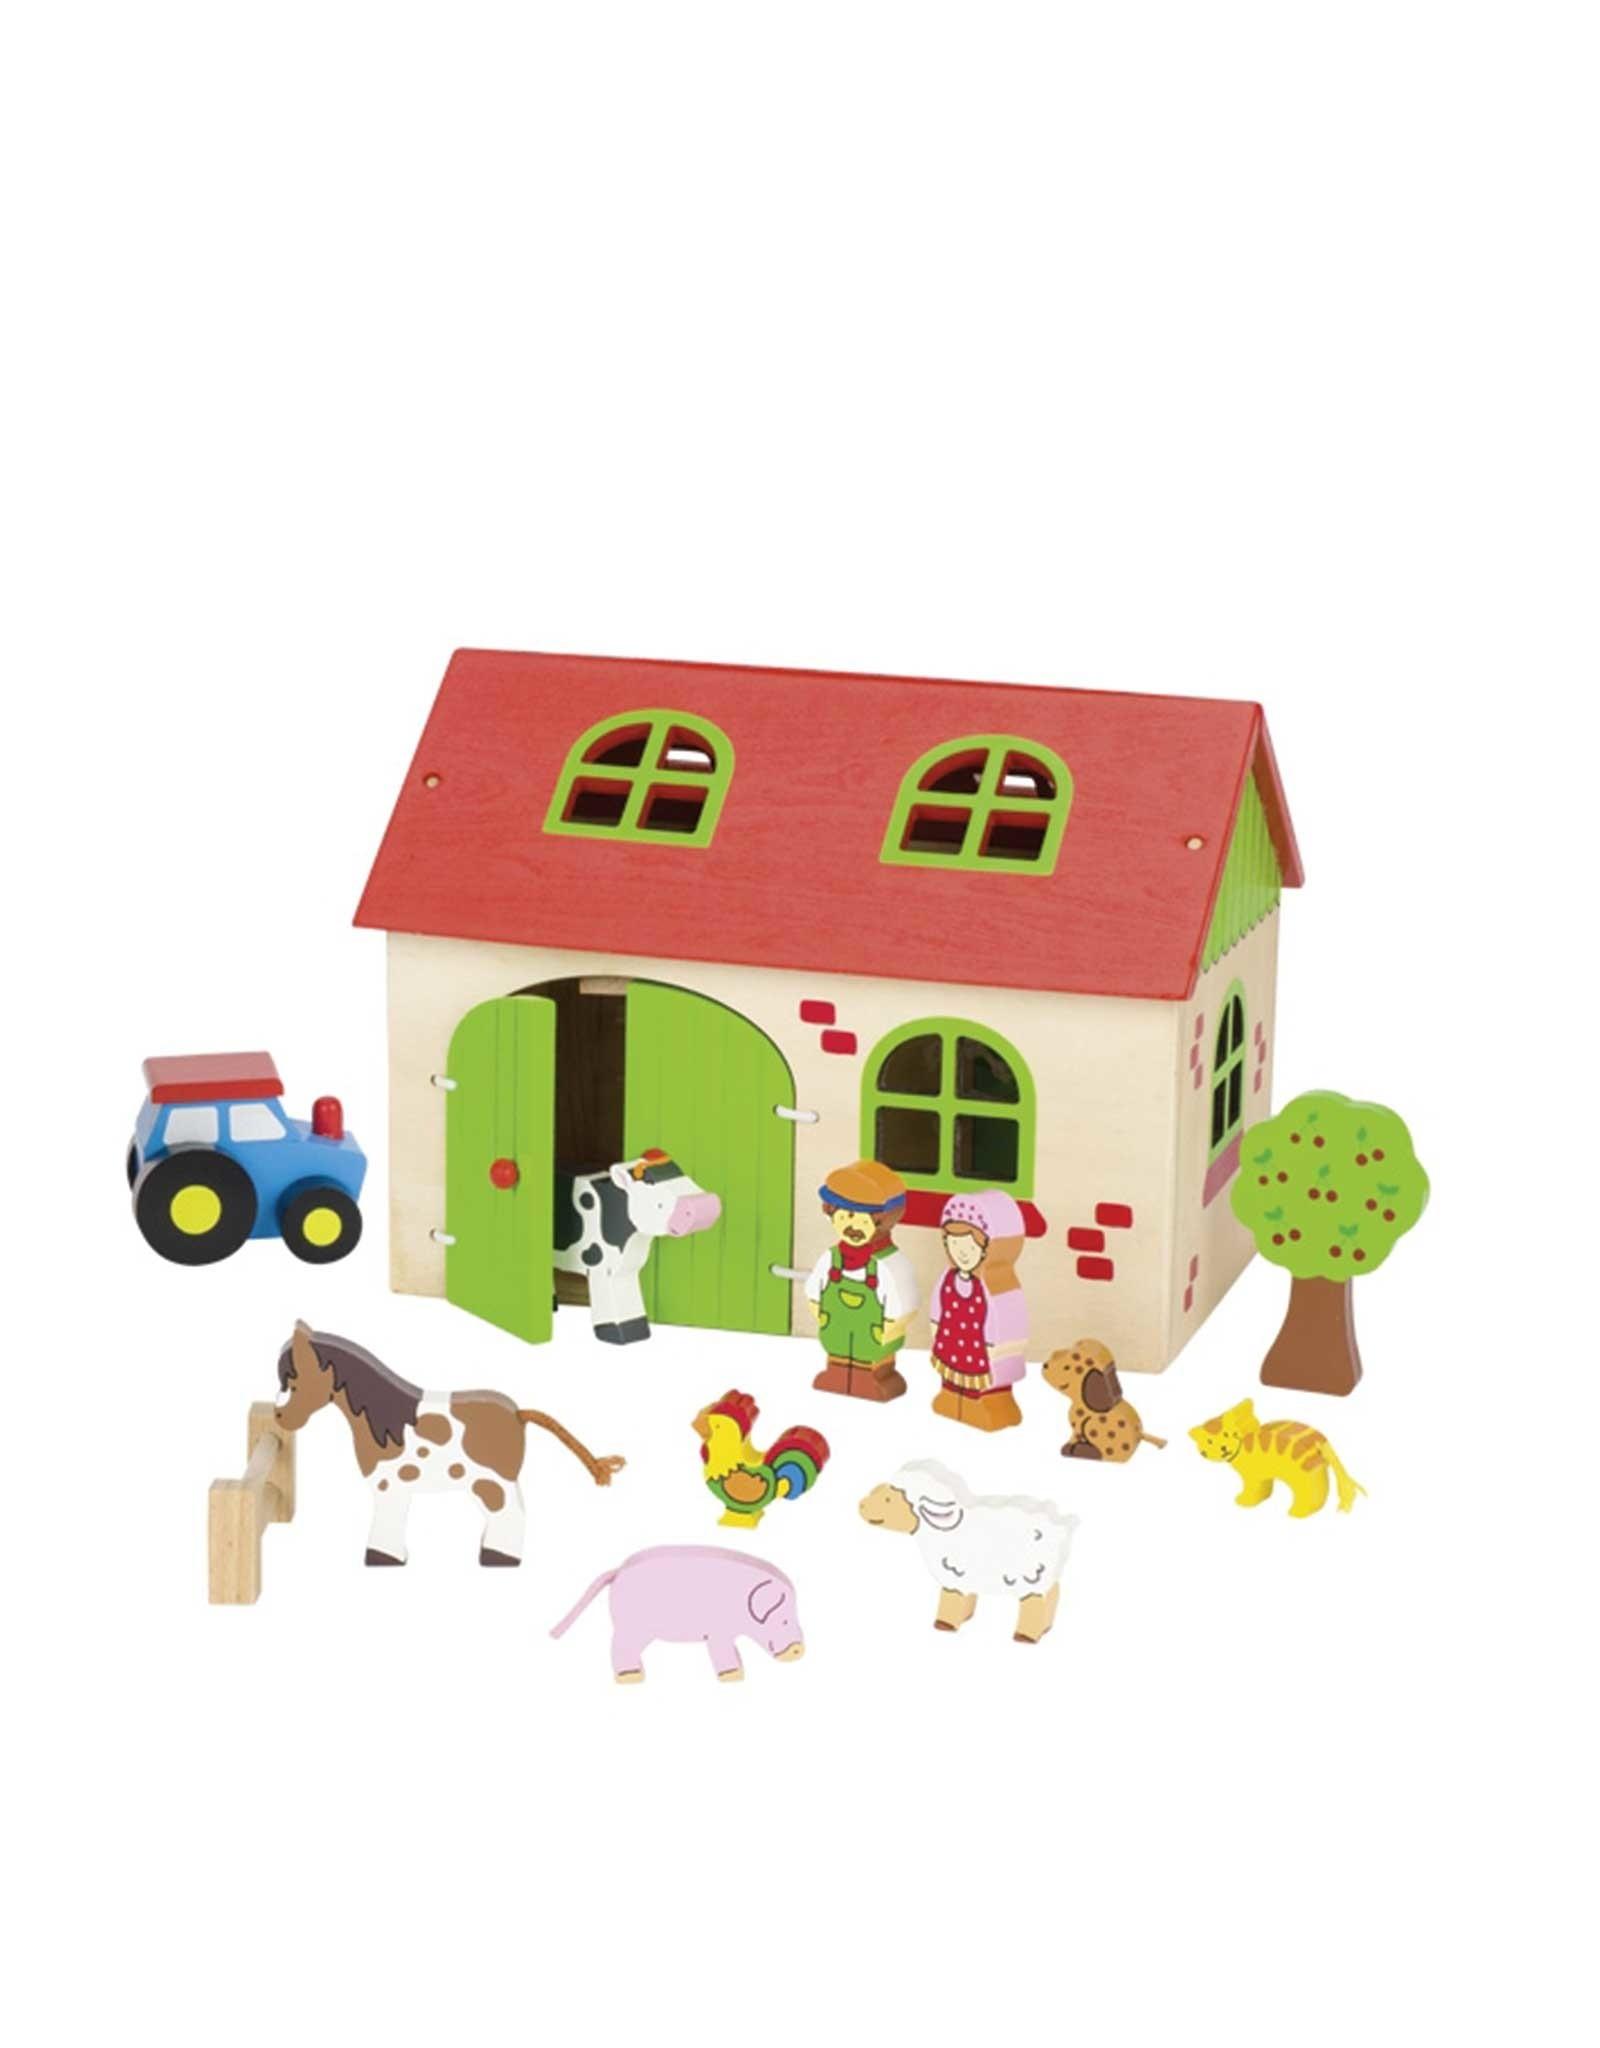 Goki Wooden Toy - My Farm